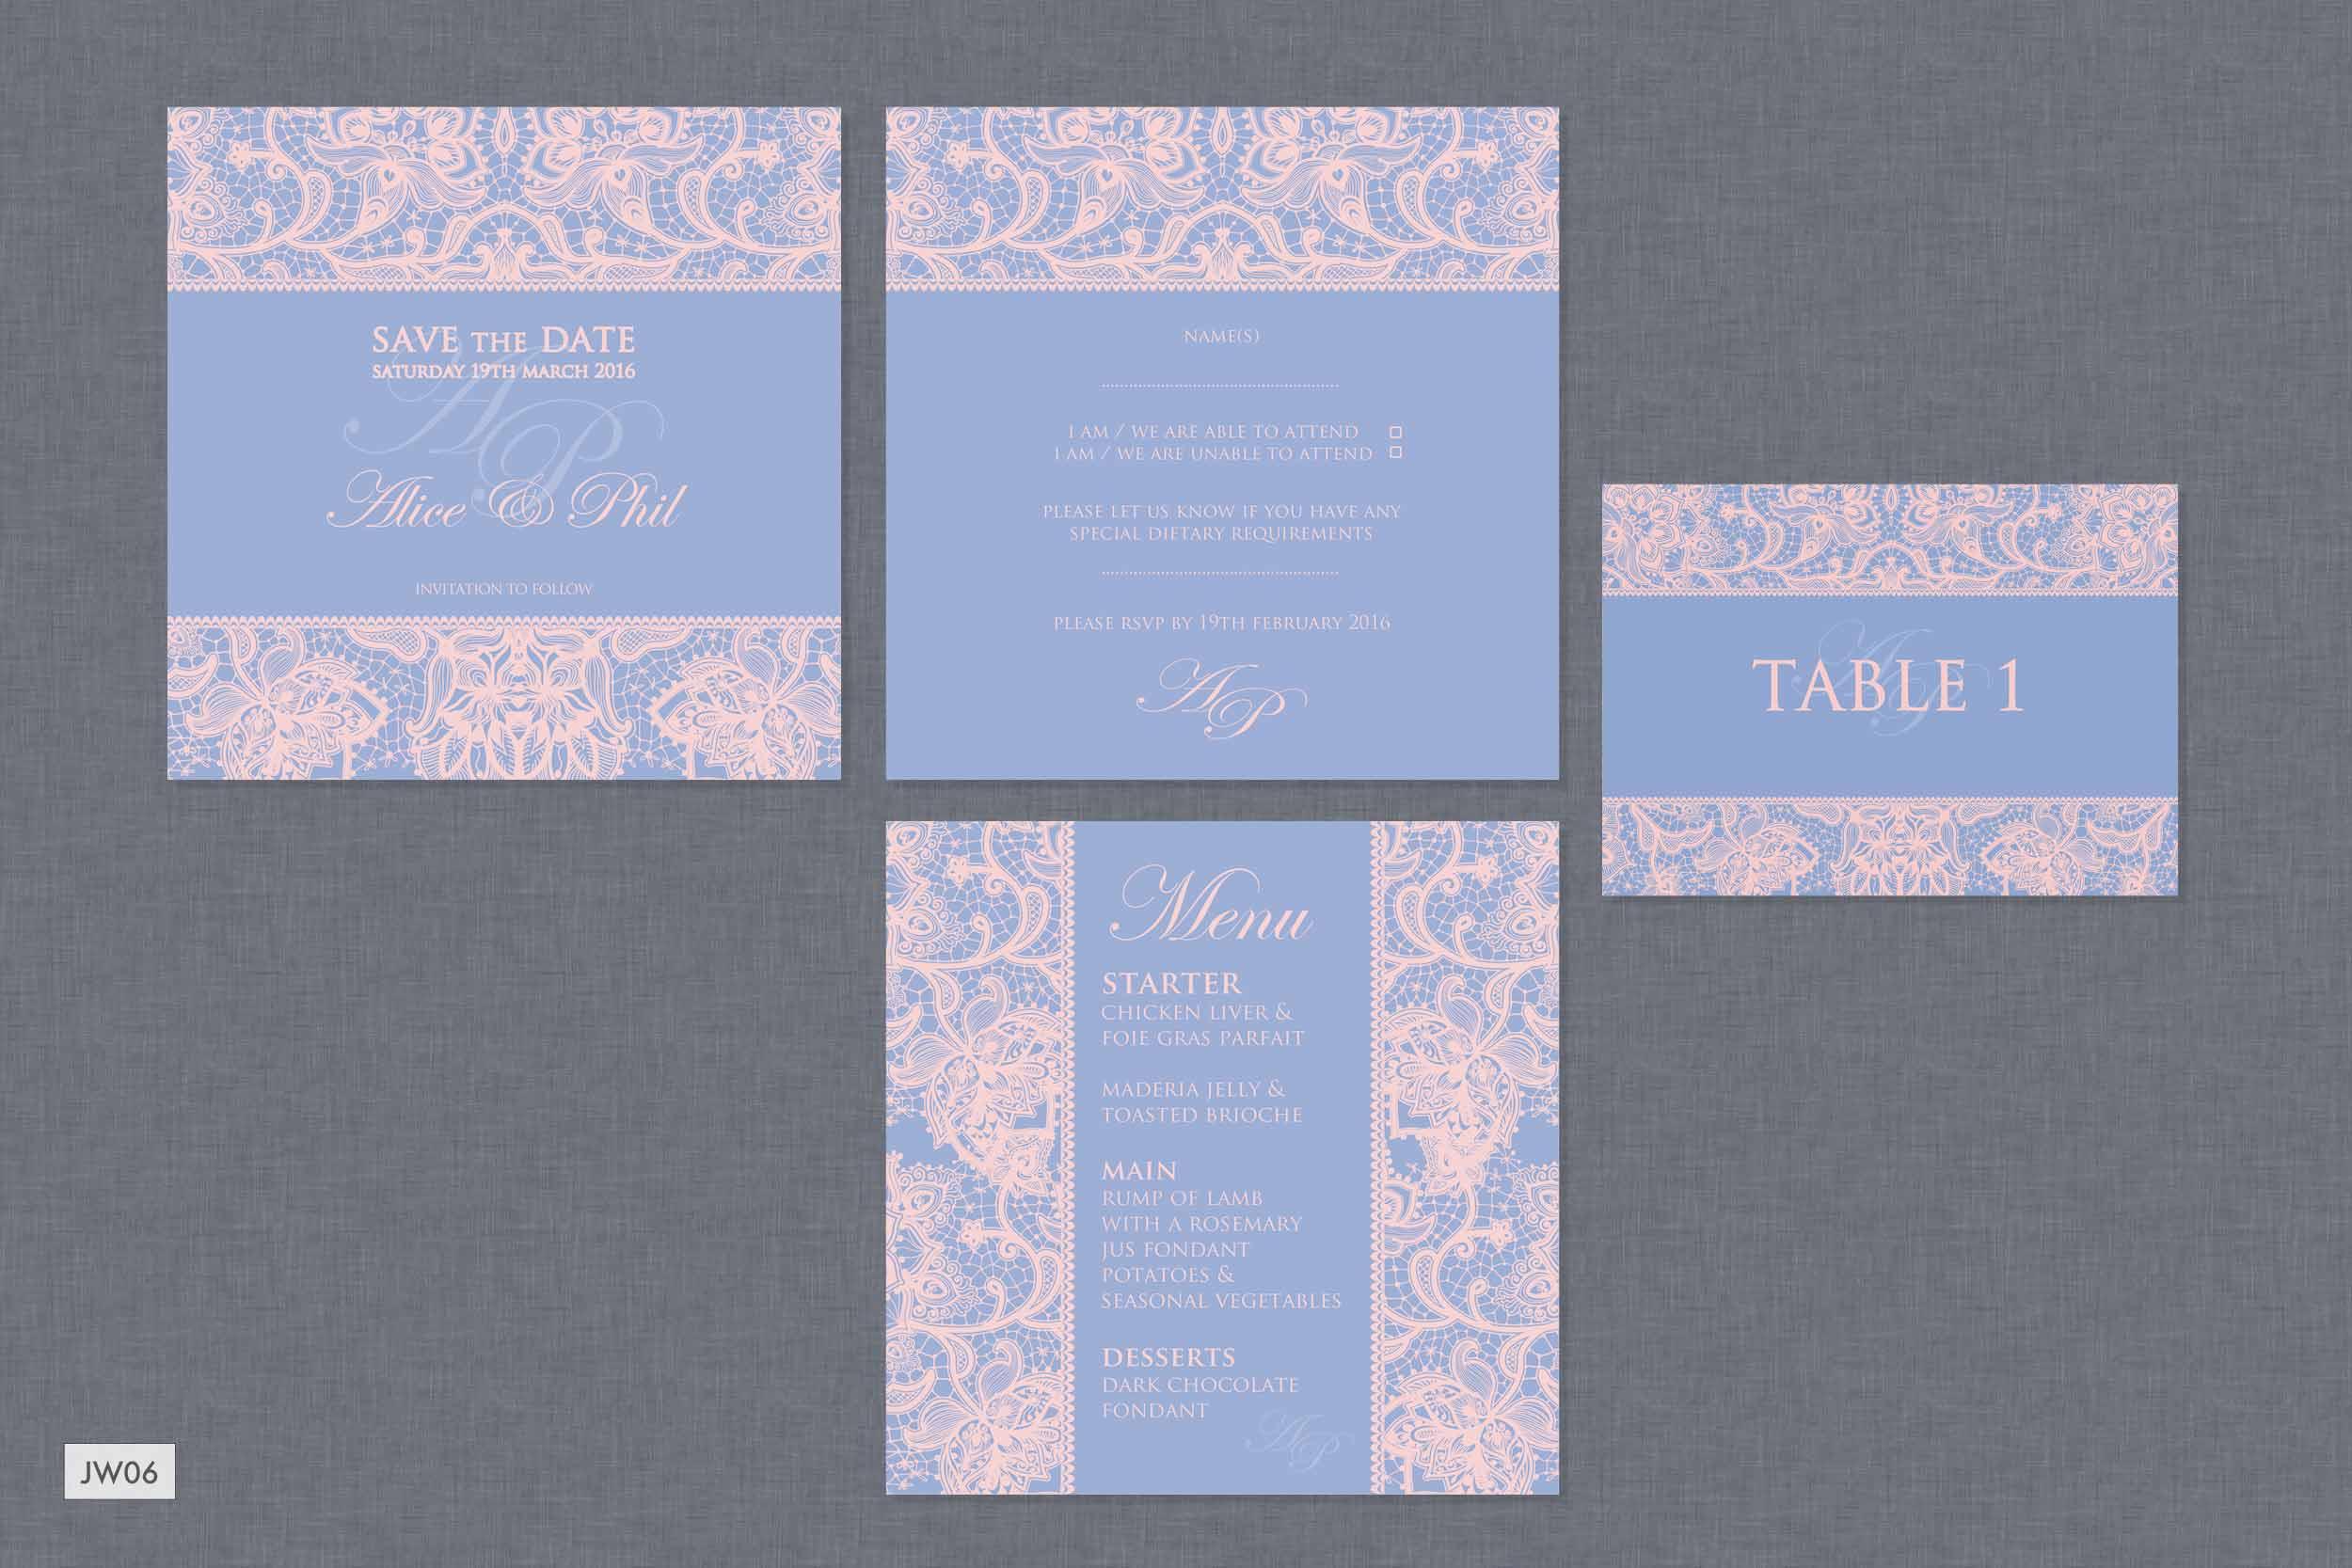 lilac_pink_lace_stationery_jersey-weddings_ananyacards.com-02.jpg